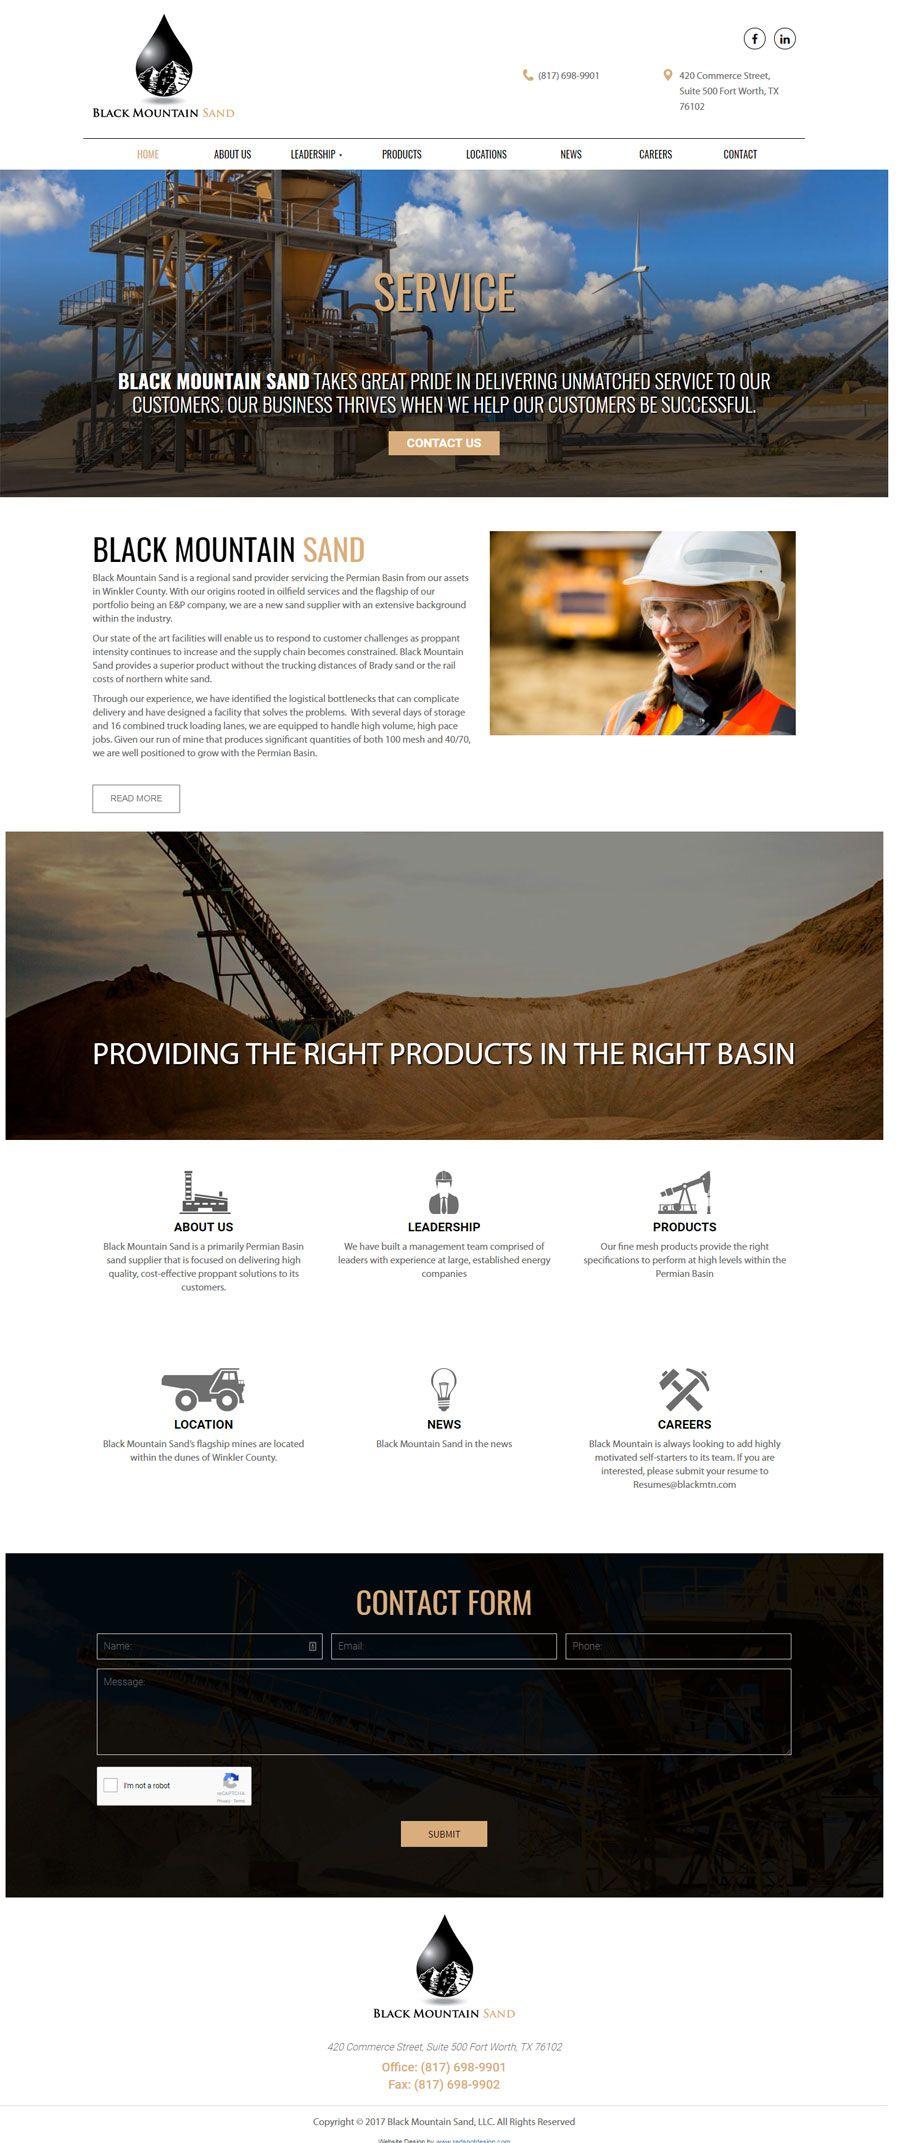 Website Design For Black Mountain Sand In Fort Worth Texas Design Clients Web Design Custom Website Design